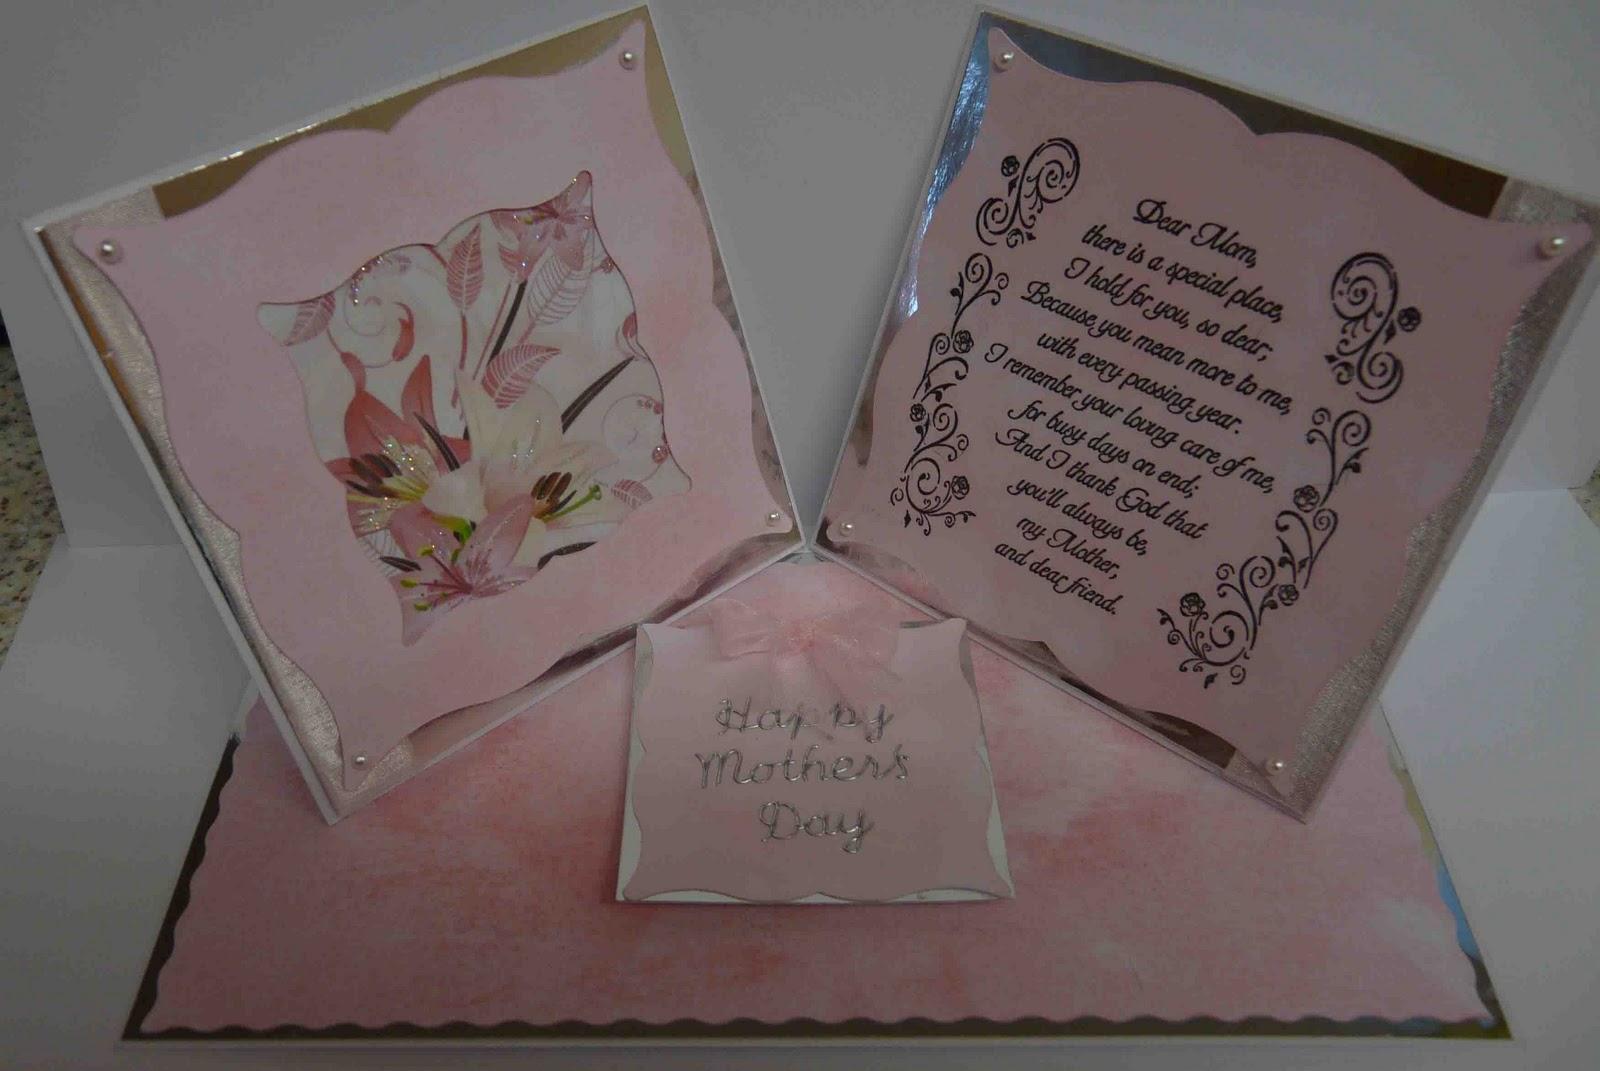 http://4.bp.blogspot.com/-wzExd8RVIEI/Tylmz84ZWcI/AAAAAAAAAGY/1HwpAb3VKhw/s1600/mothers+day+1.jpg